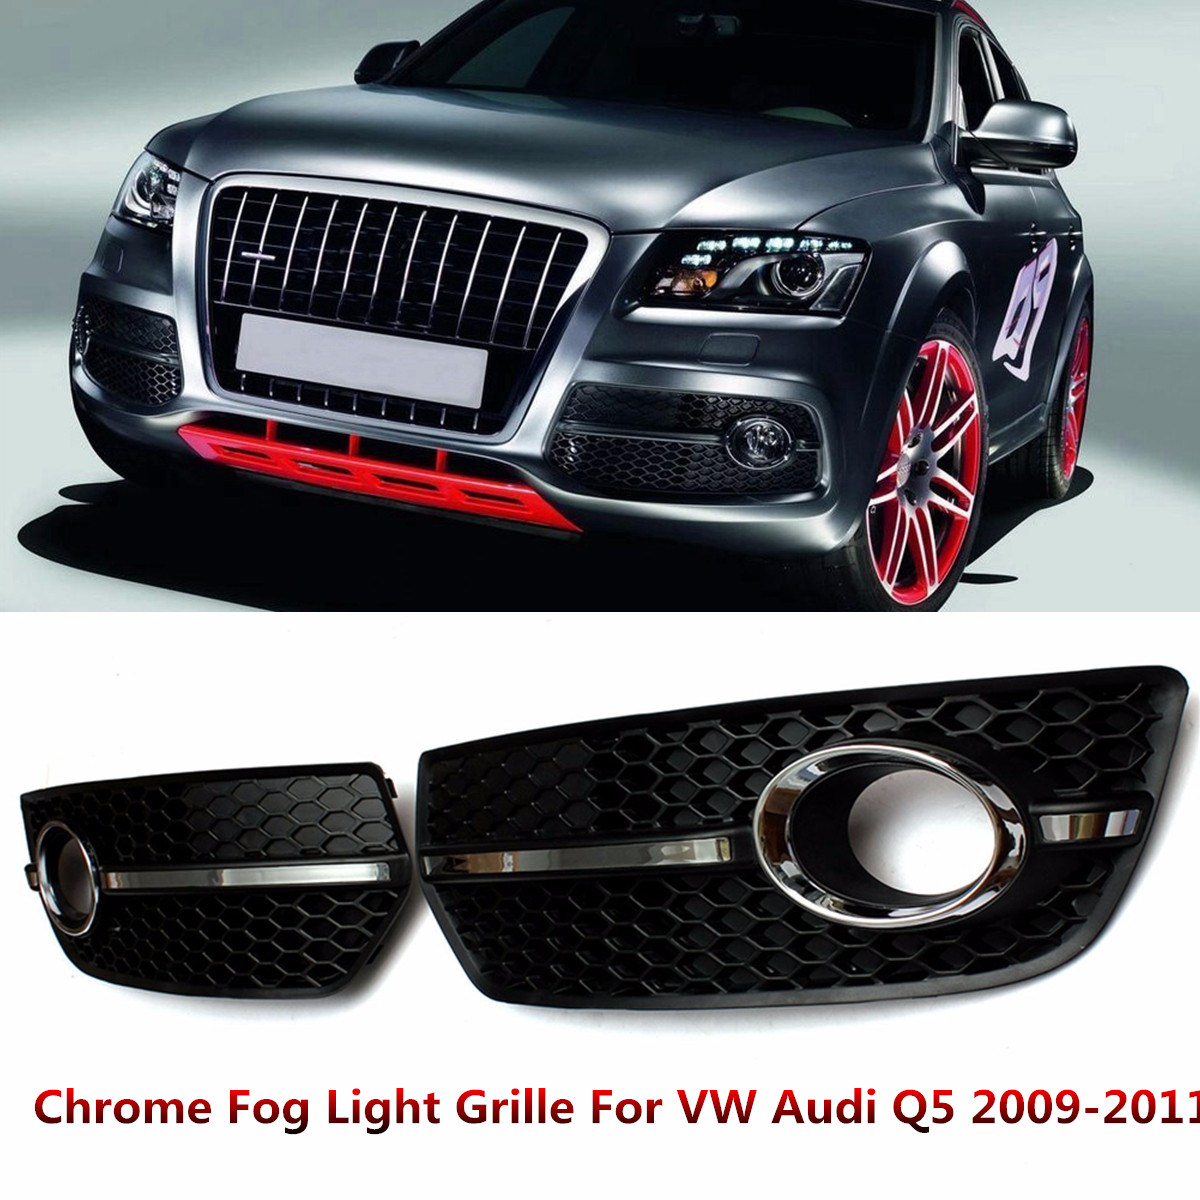 Pair Chrome Fog Light Cover S LINE Style Grille Grill for VW for Audi Q5 2009 2010 2011 Lamp Hoods